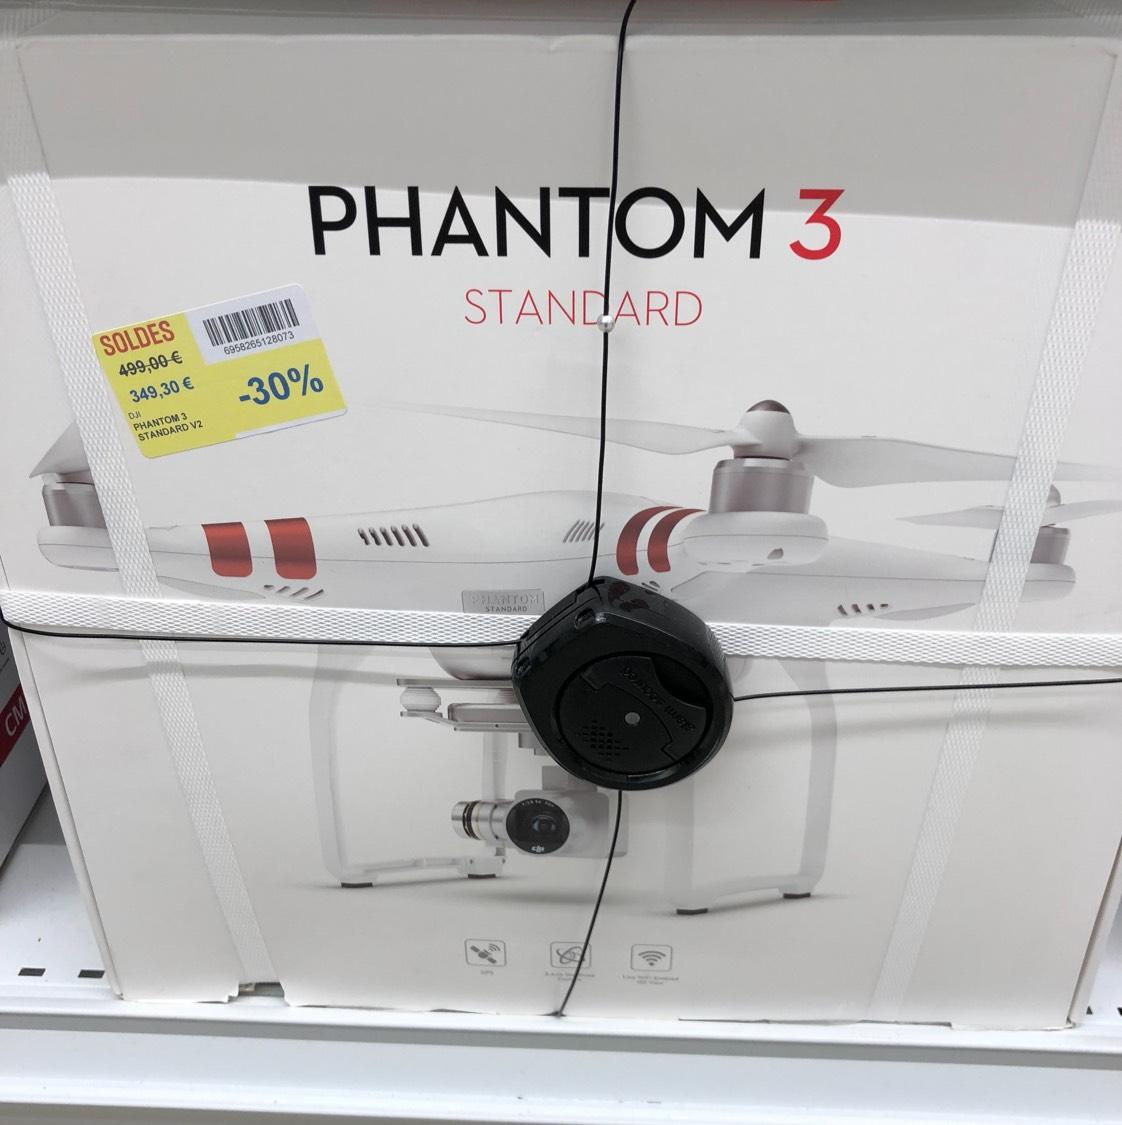 Drone quadricoptère DJI Phantom 3 standard - Carrefour millénaire Aubervilliers (93)